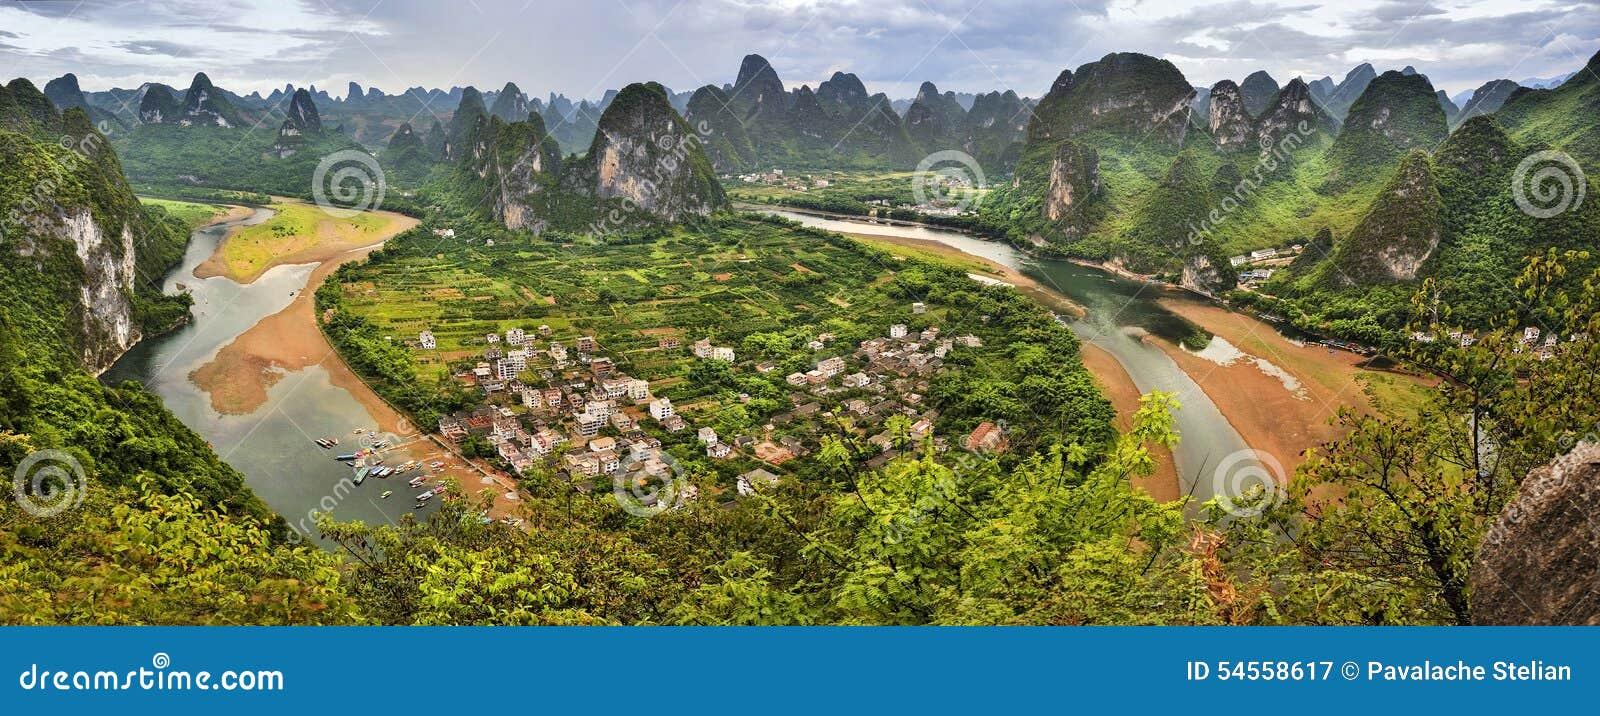 Great panoramic view of guilin Scenery